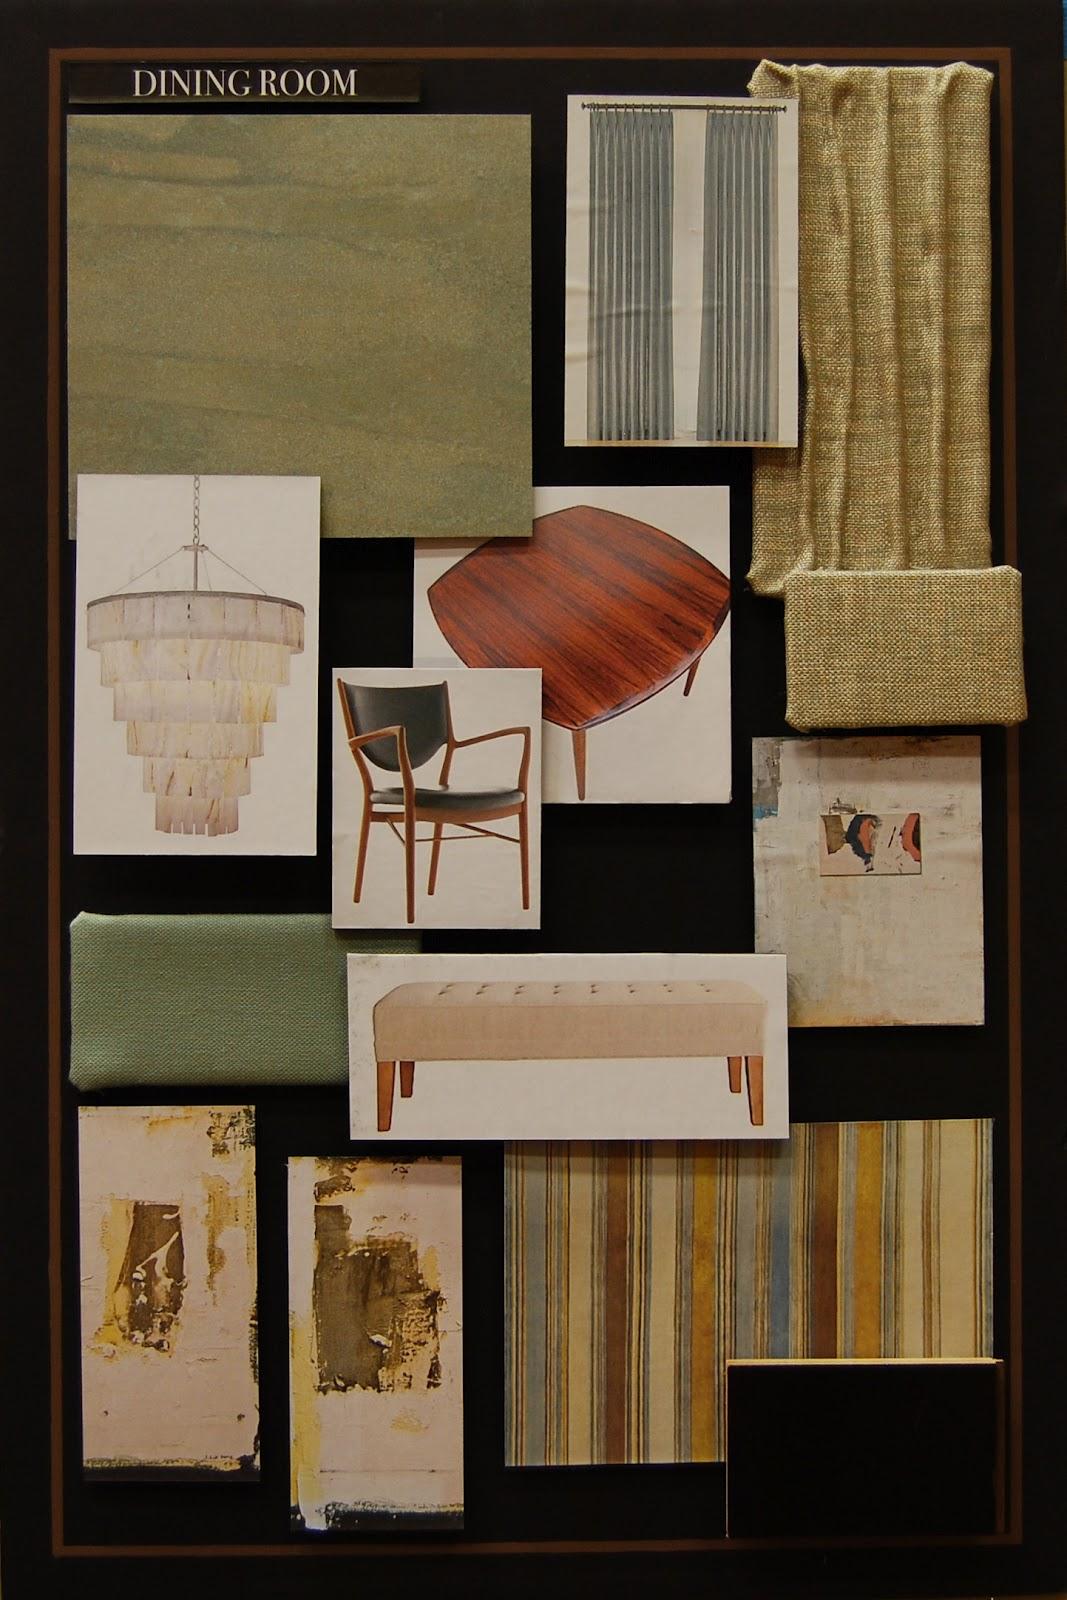 Furniture Fixtures And Equipment Interior Design ~ Pcm interior design furniture fixtures and equipment